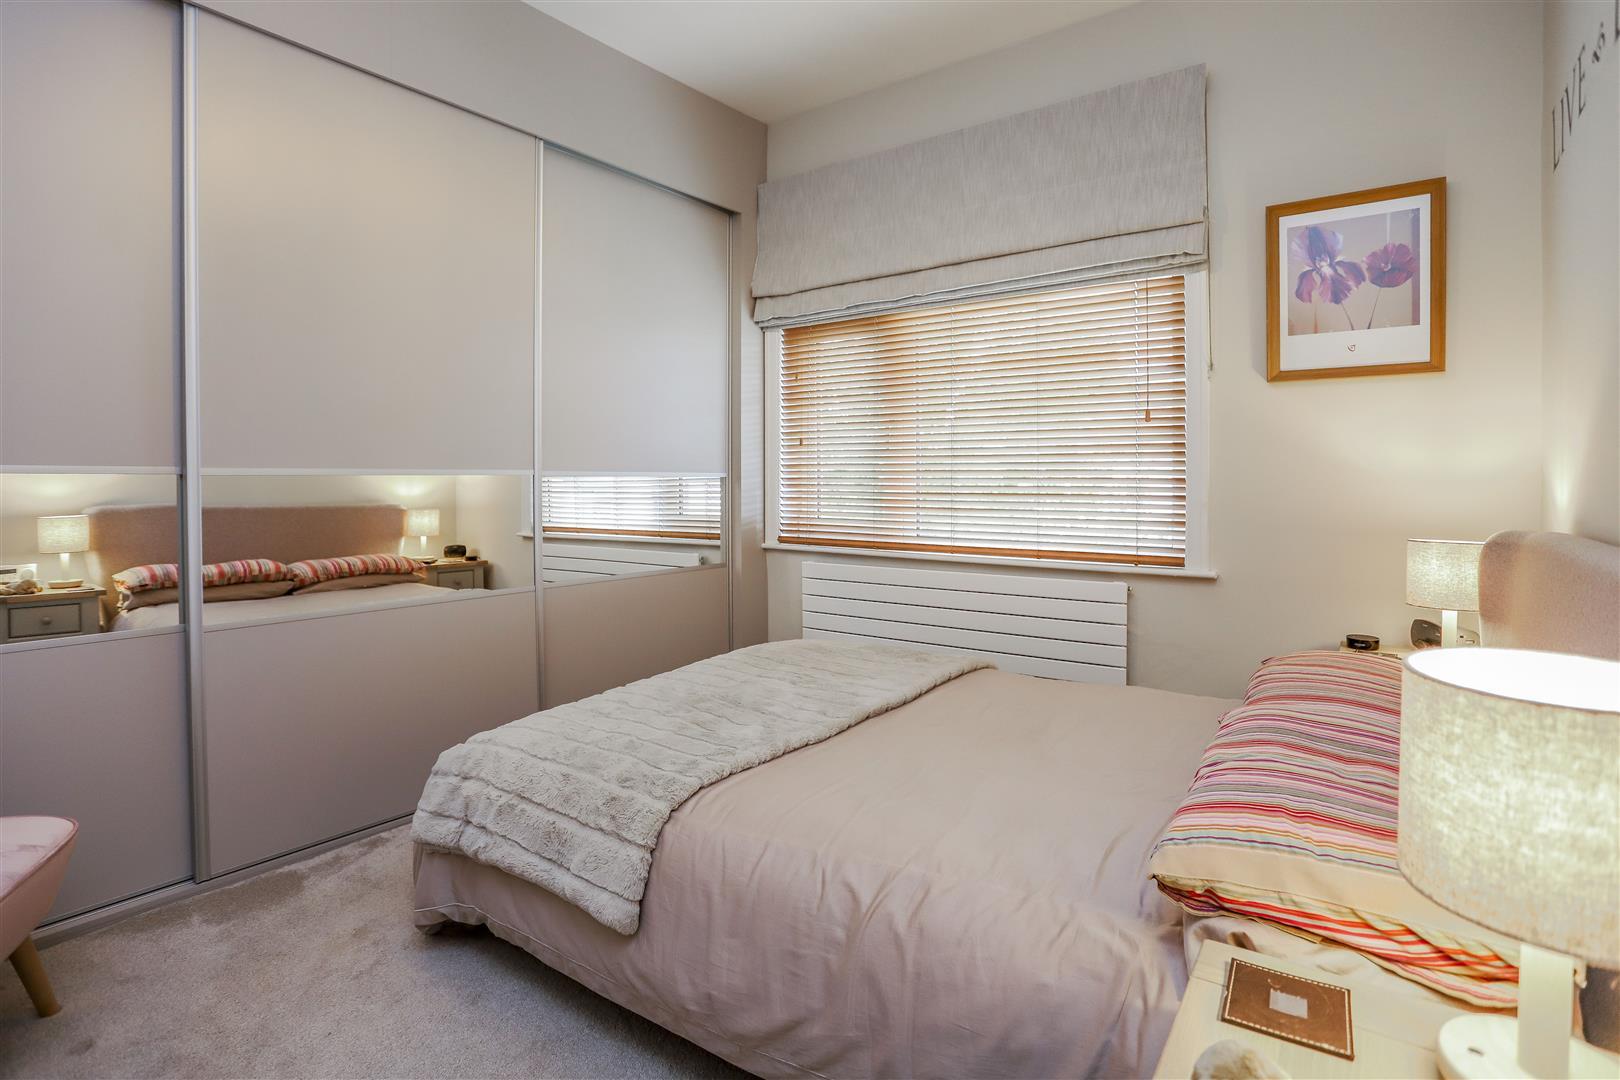 3 Bedroom Semi-detached House For Sale - 18.JPG